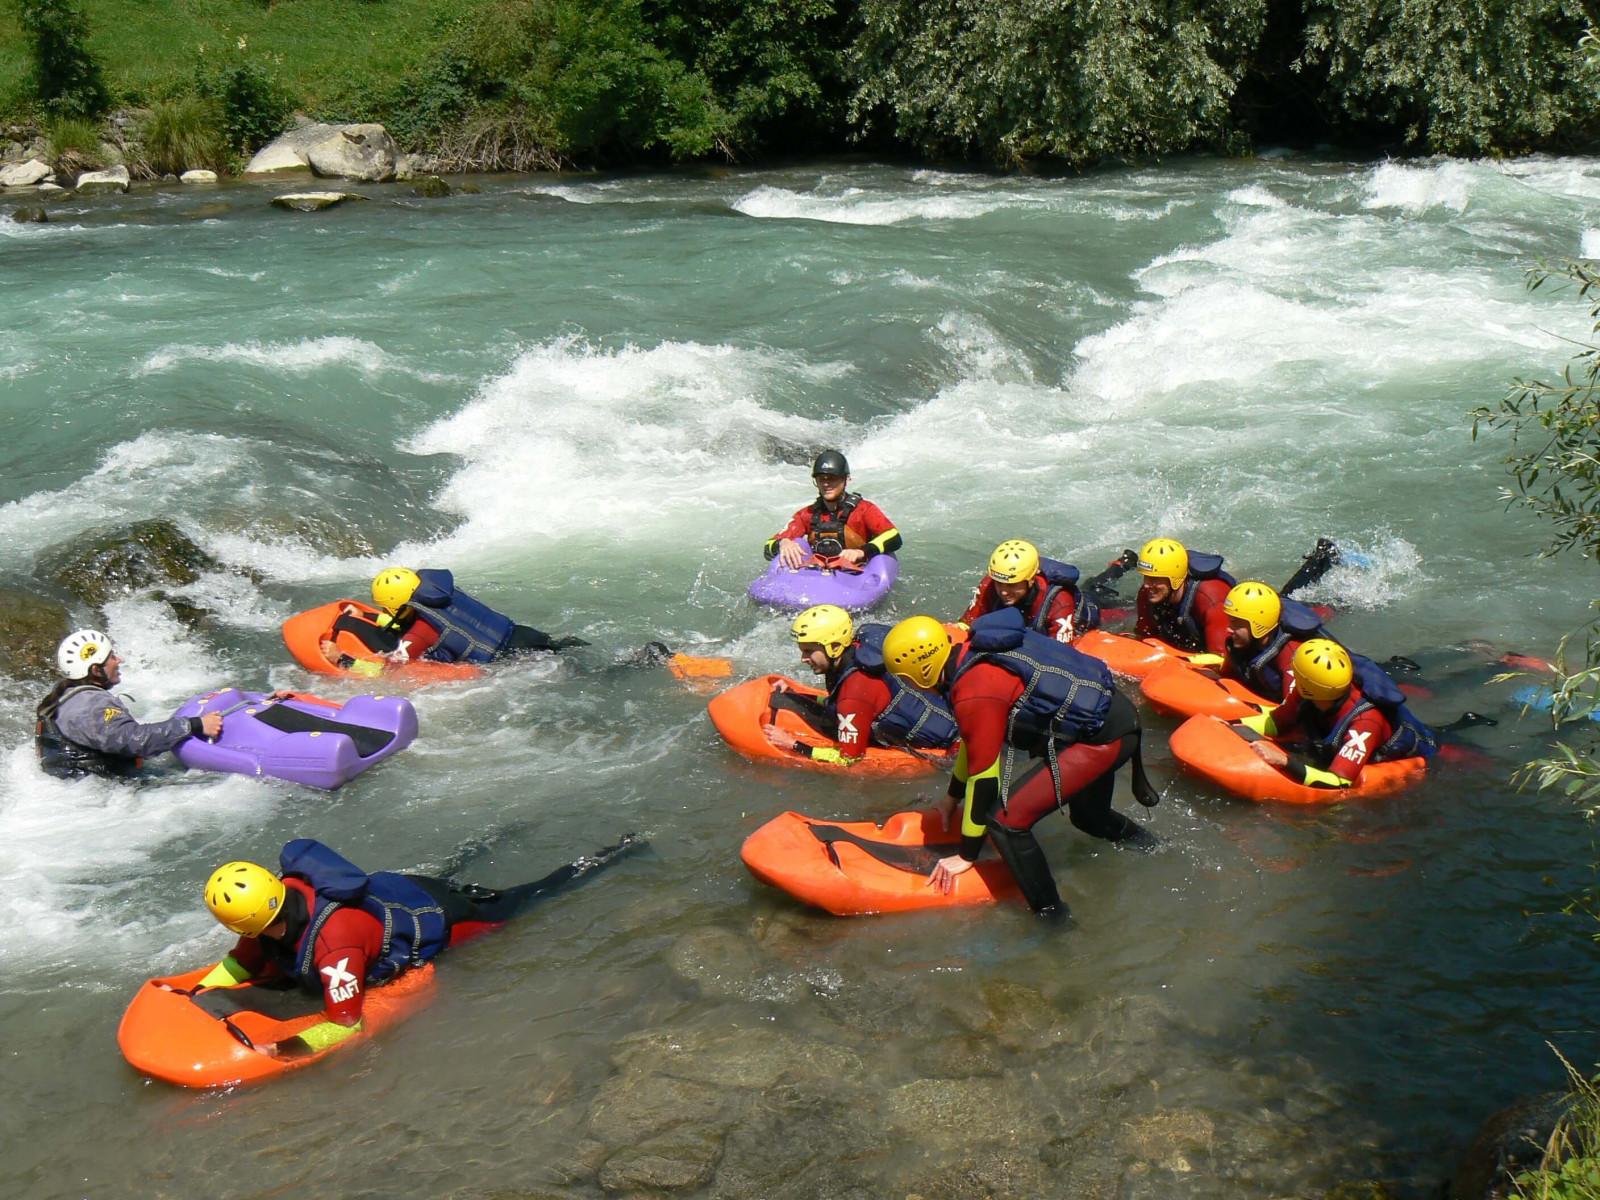 Hydrospeed Extreme sul fiume Noce in Trentino